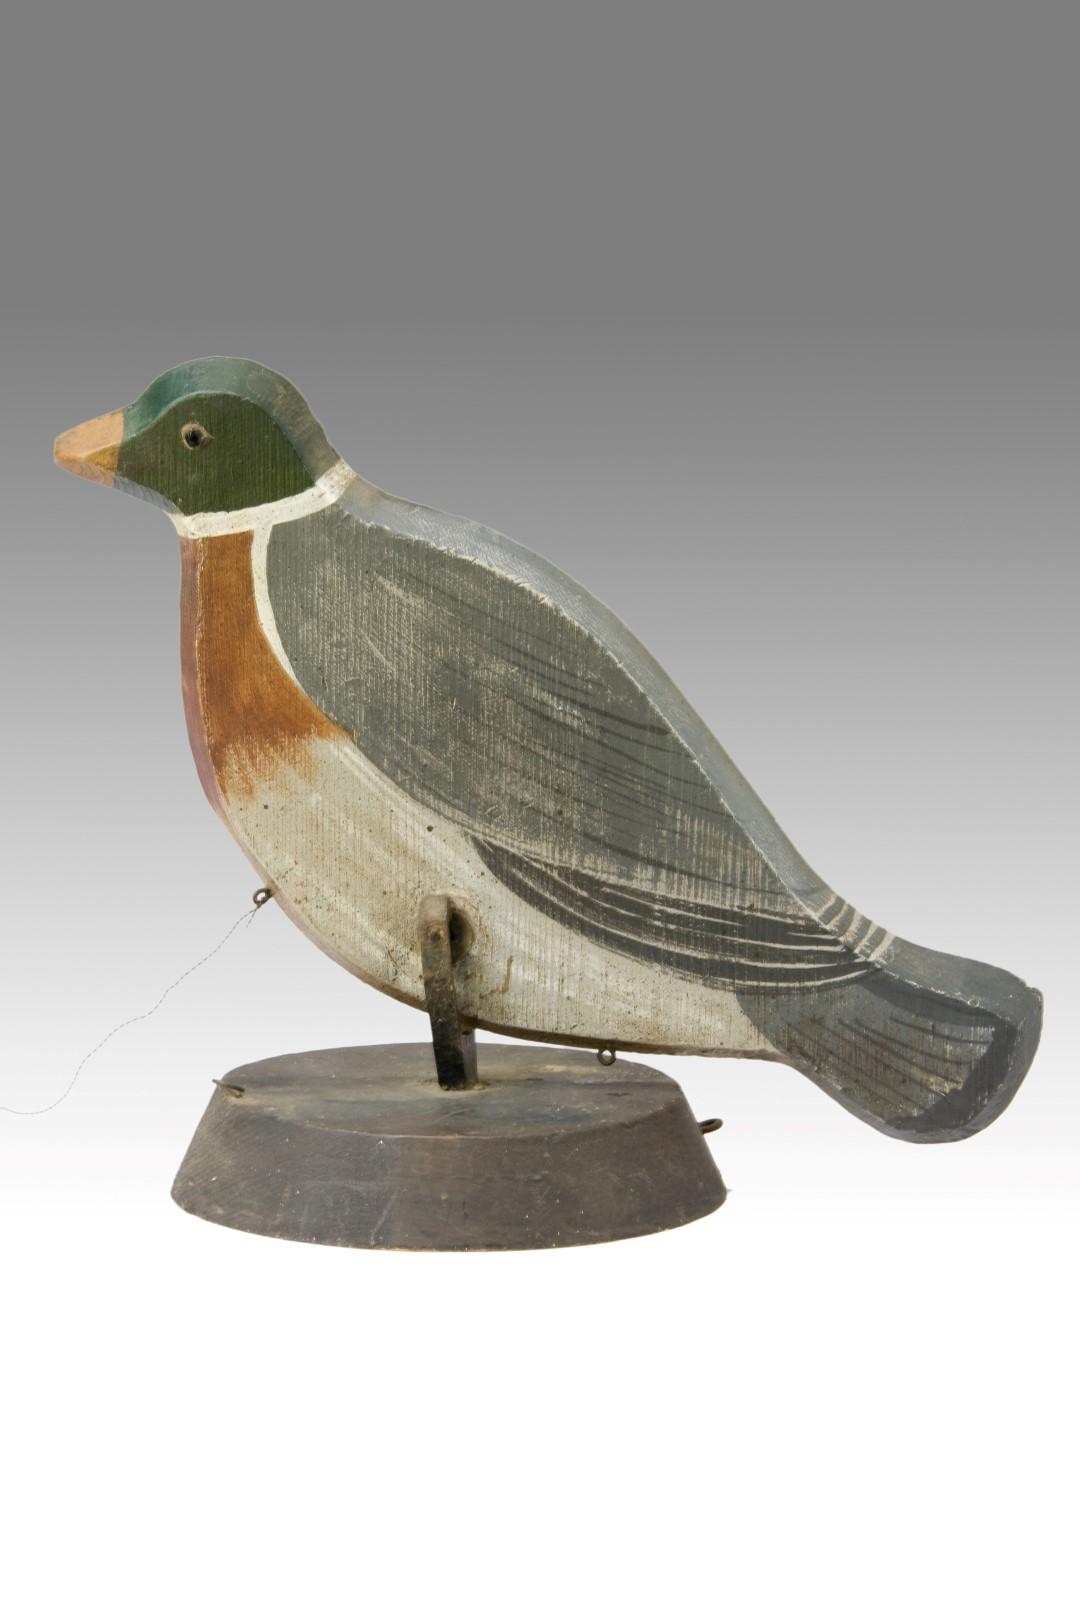 A Pecking Decoy Bird